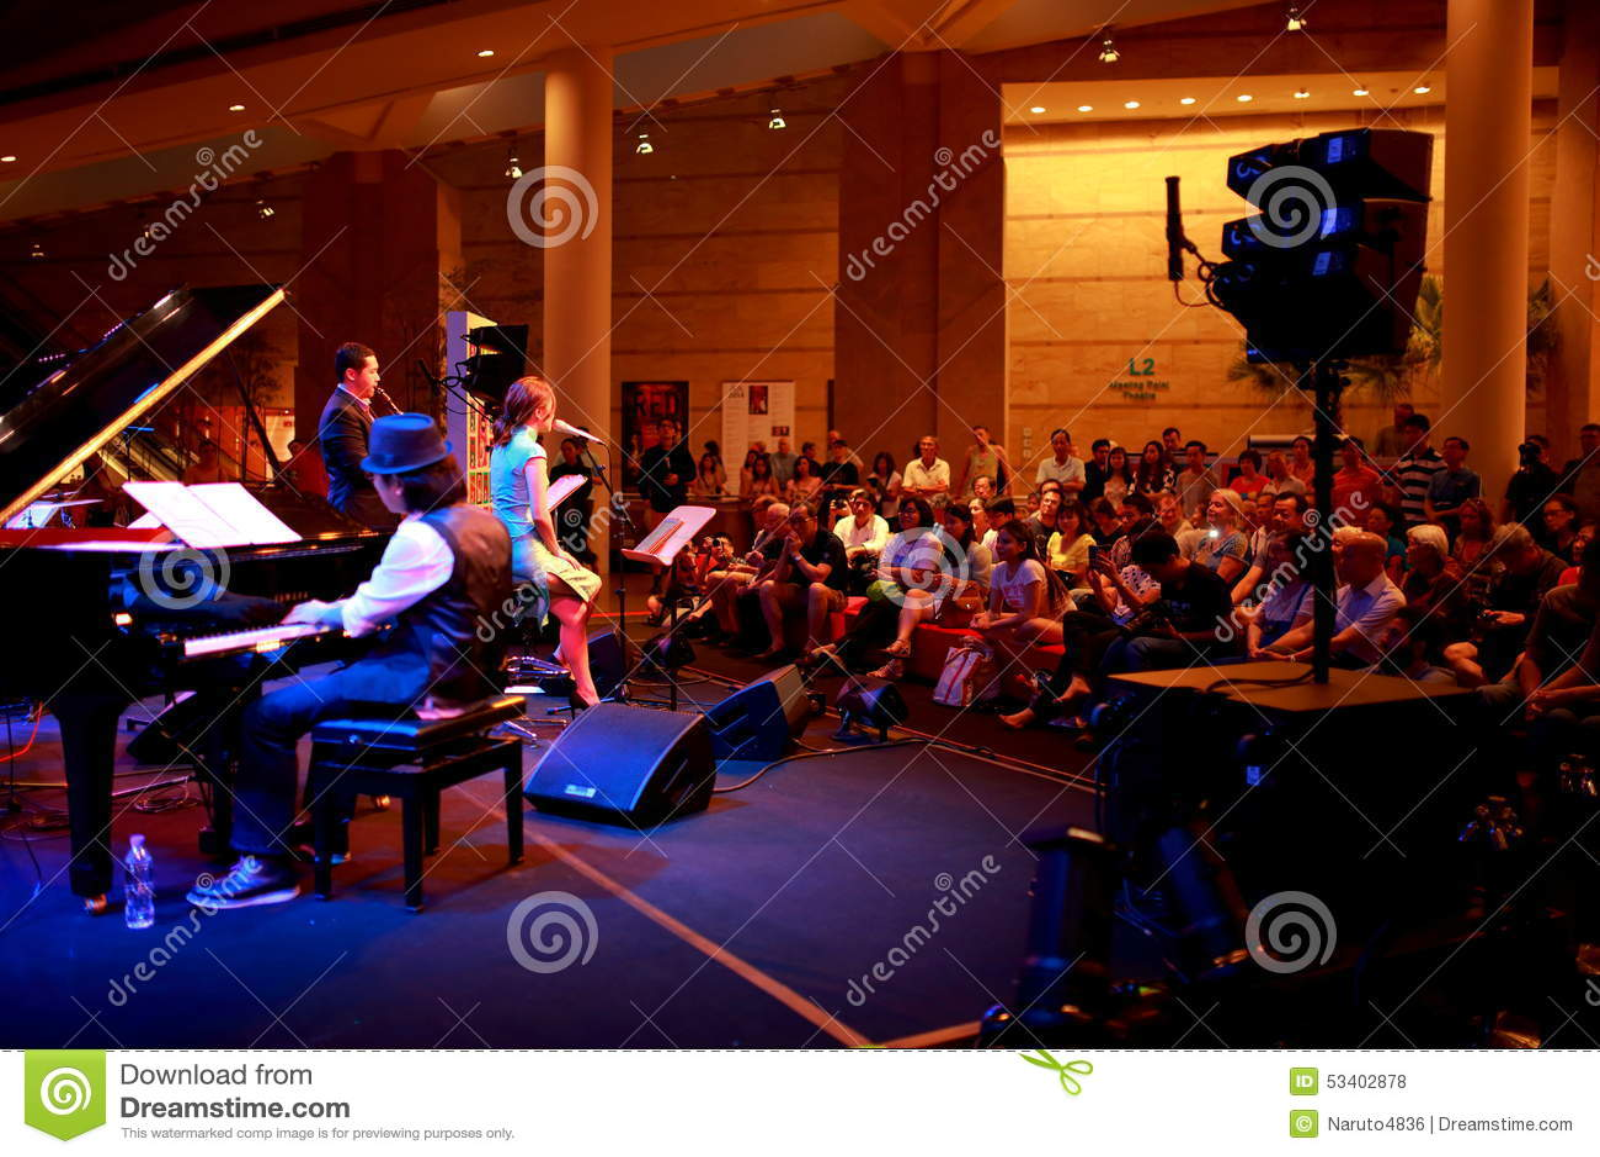 Performance At Esplanade Singapore Editorial Stock Photo